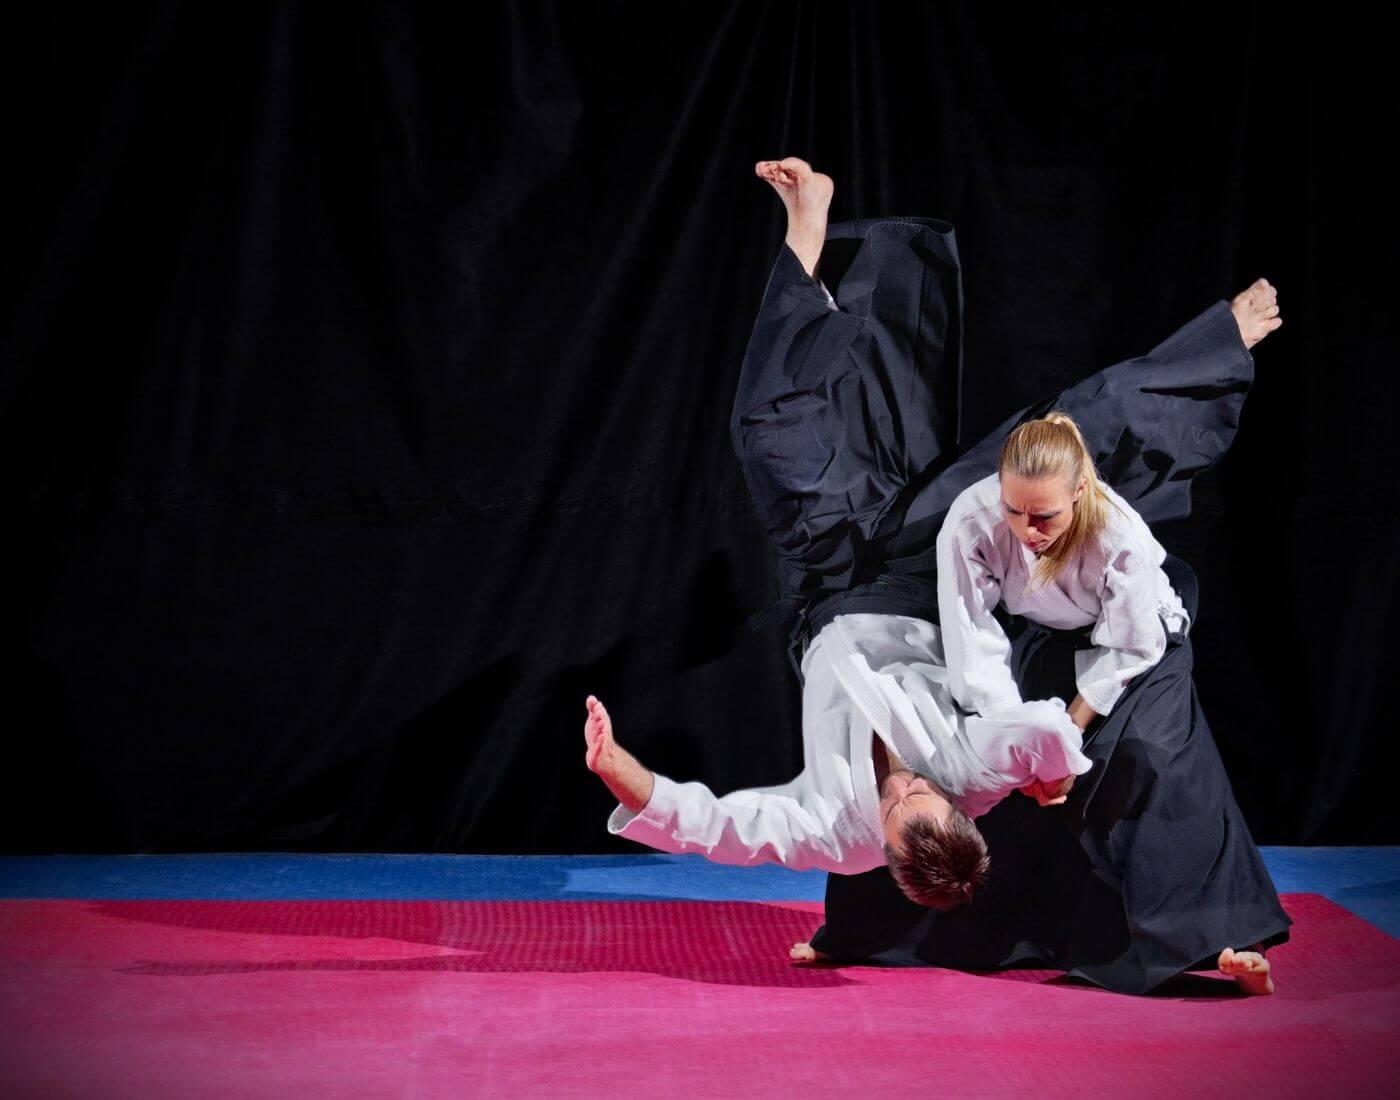 aikido martial arts